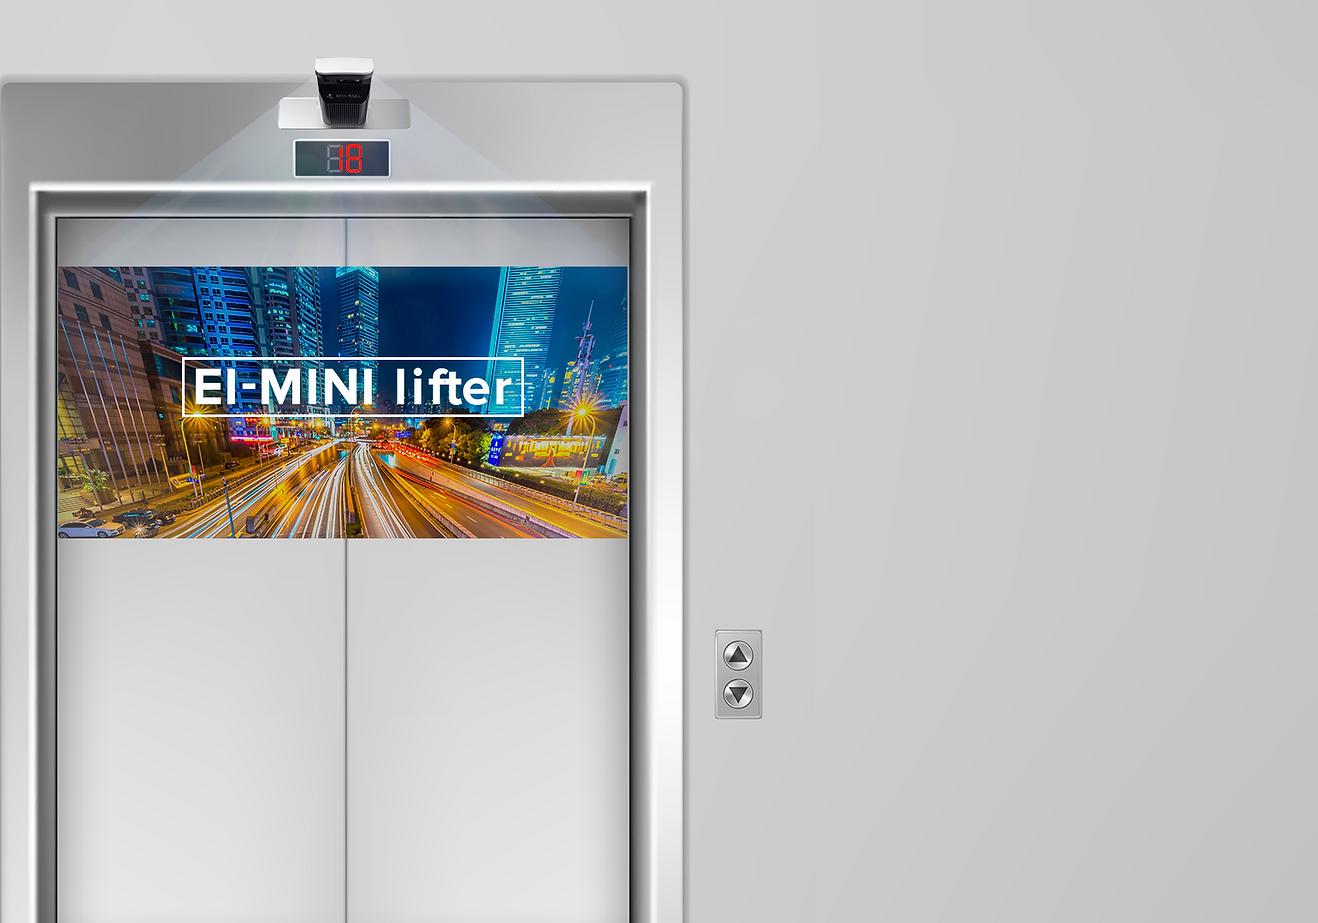 Elevator Advertising audience image